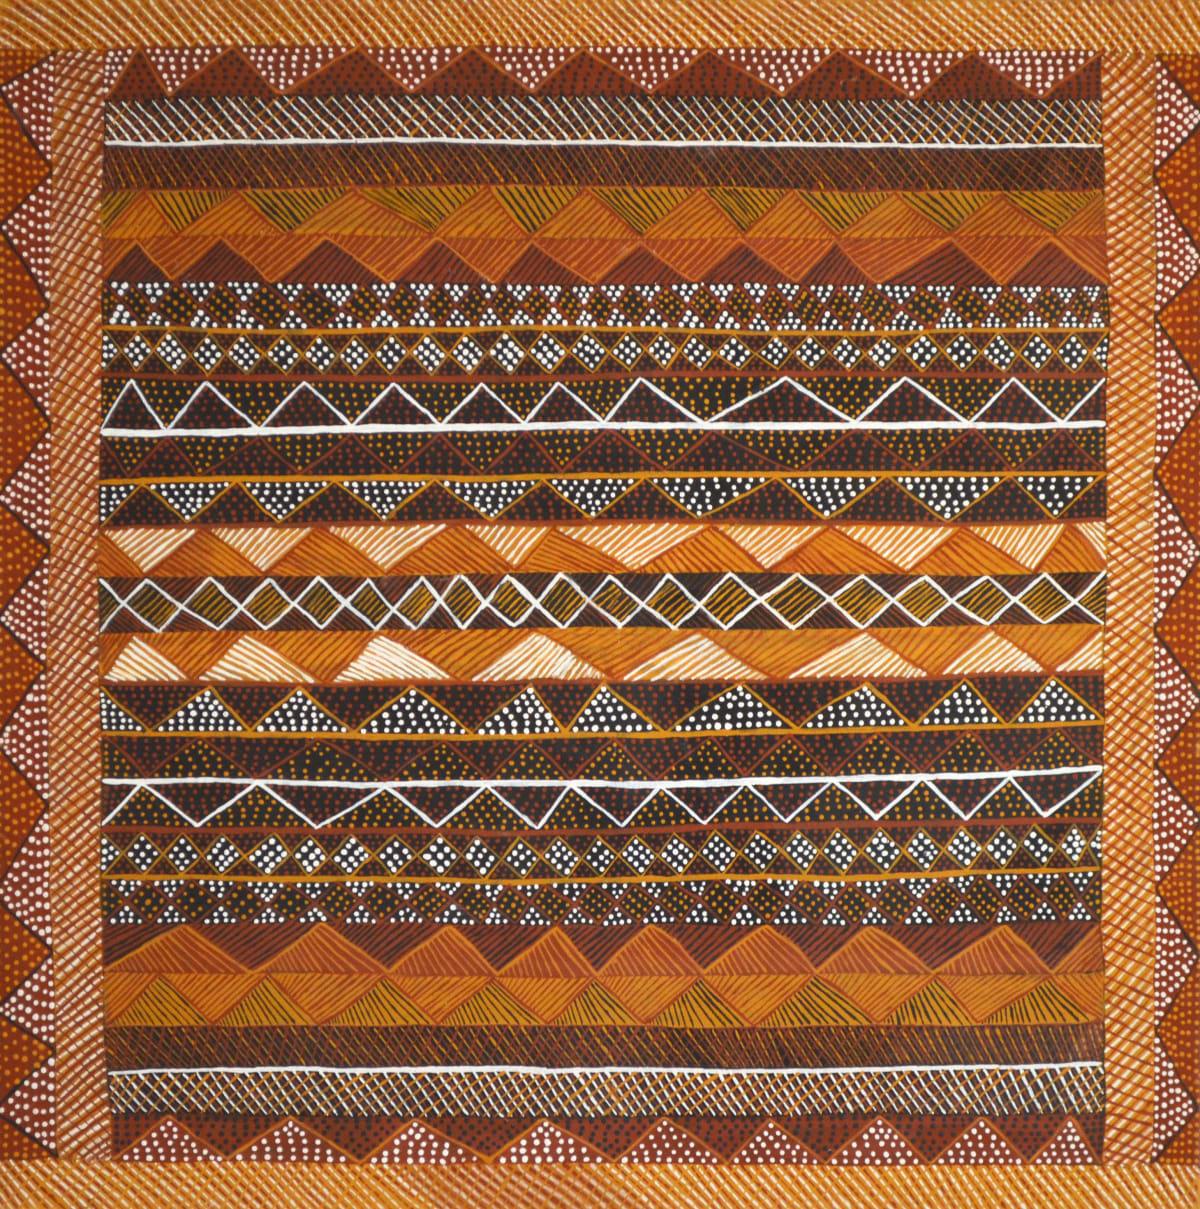 Jacinta Lorenzo Jilamara natural ochres on linen 120 x 120 cm